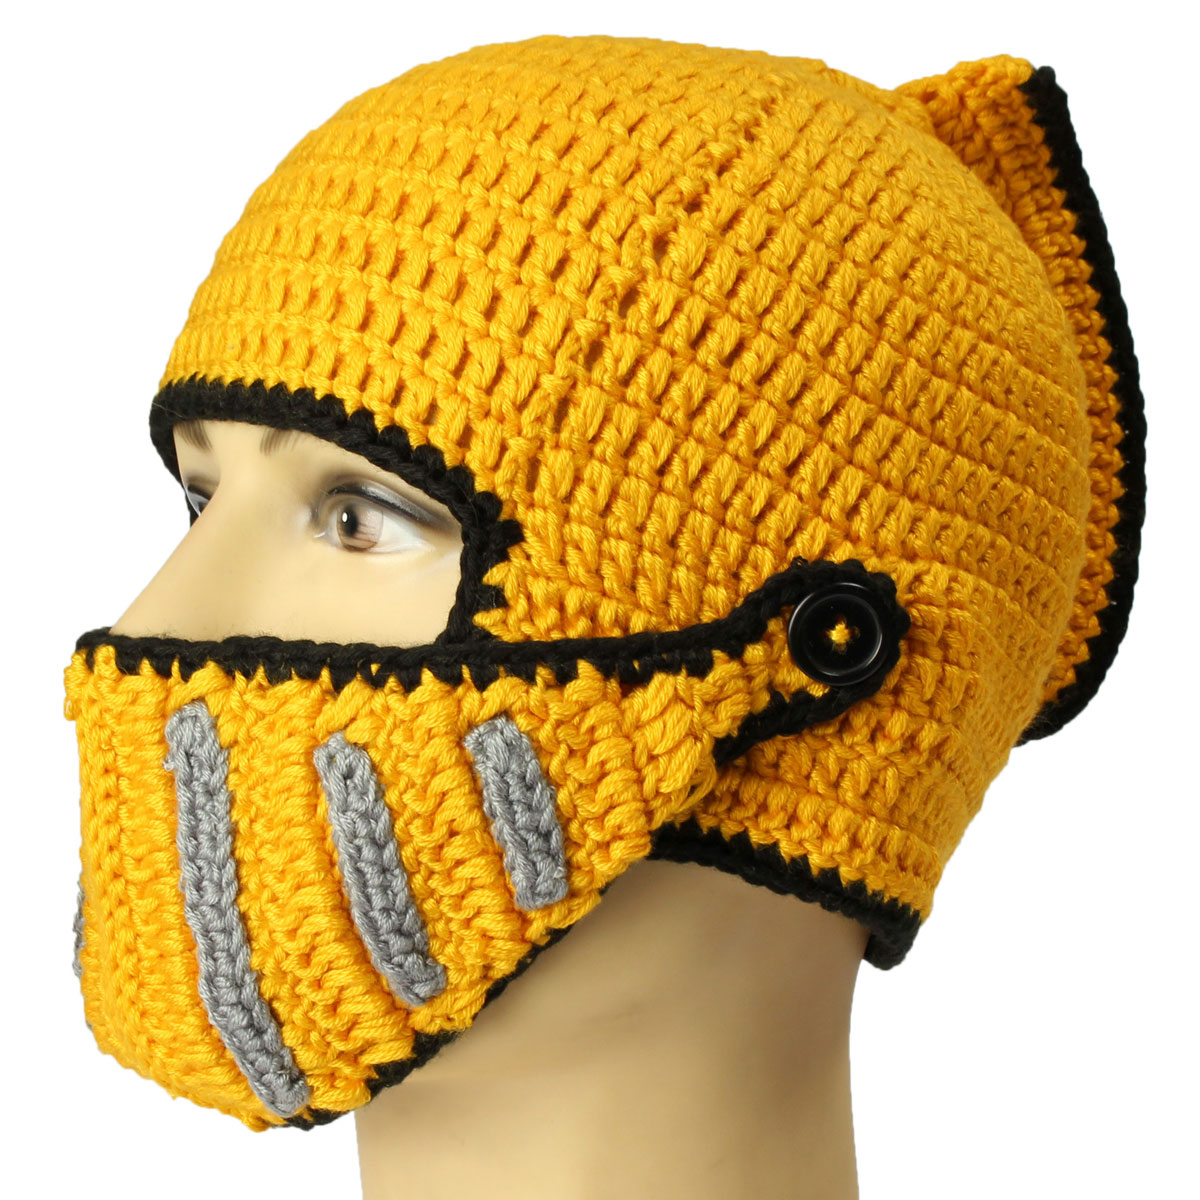 Unisex Men Knit Face Mask Beard Cap Crochet Ski Mustache Winter Warm Beanie Hat